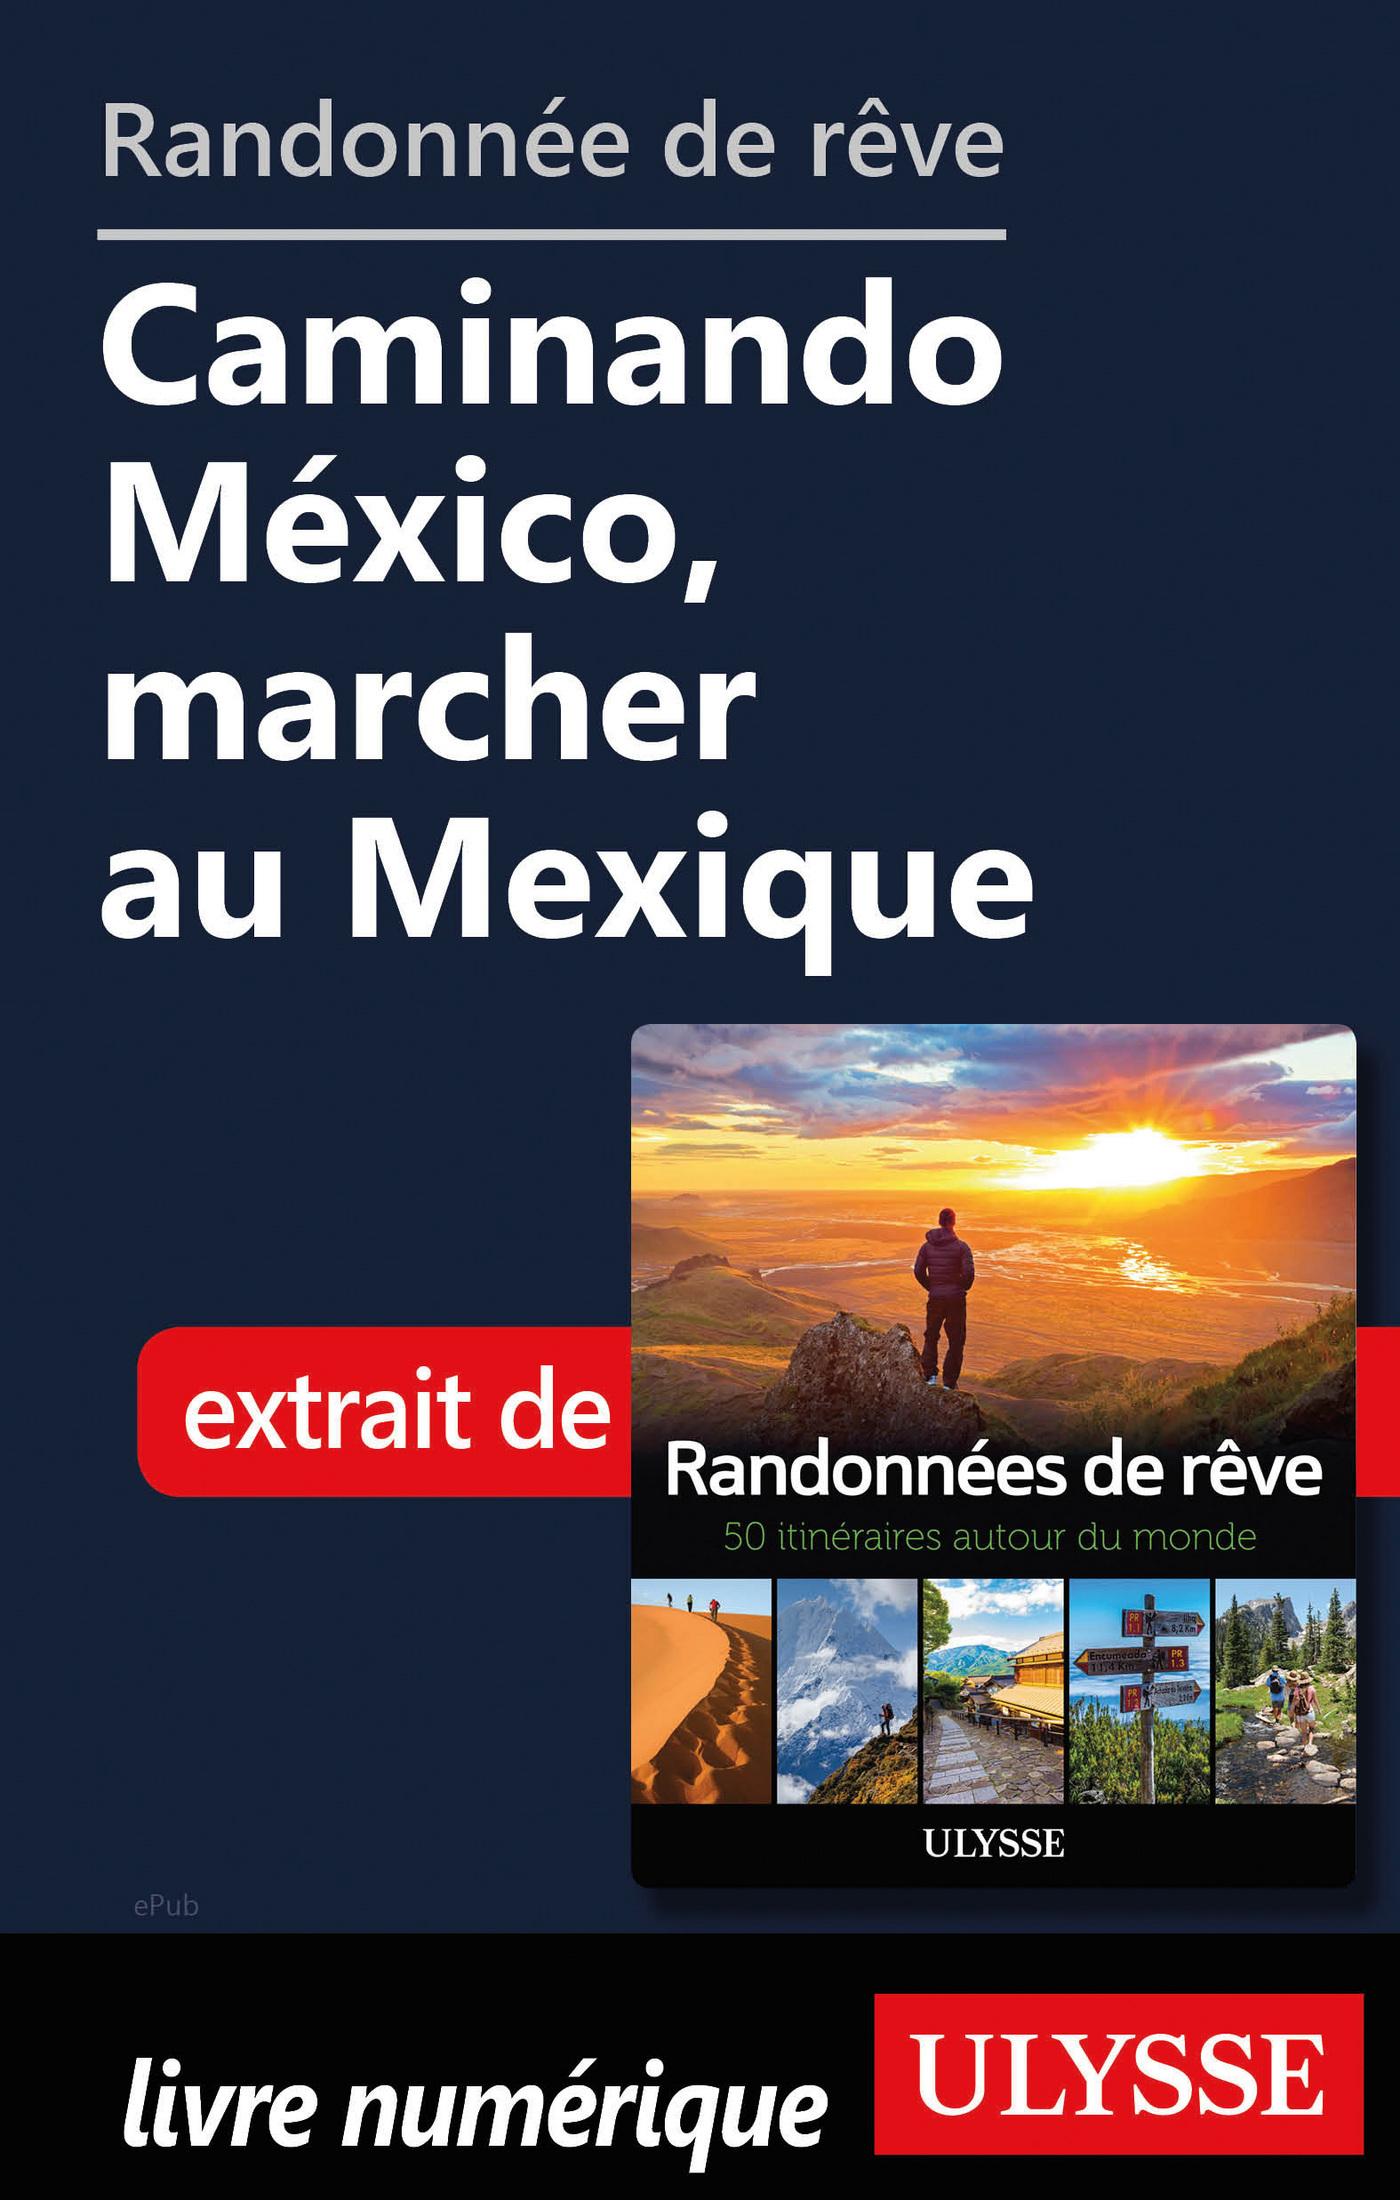 Randonnée de rêve - Caminando México, marcher au Mexique